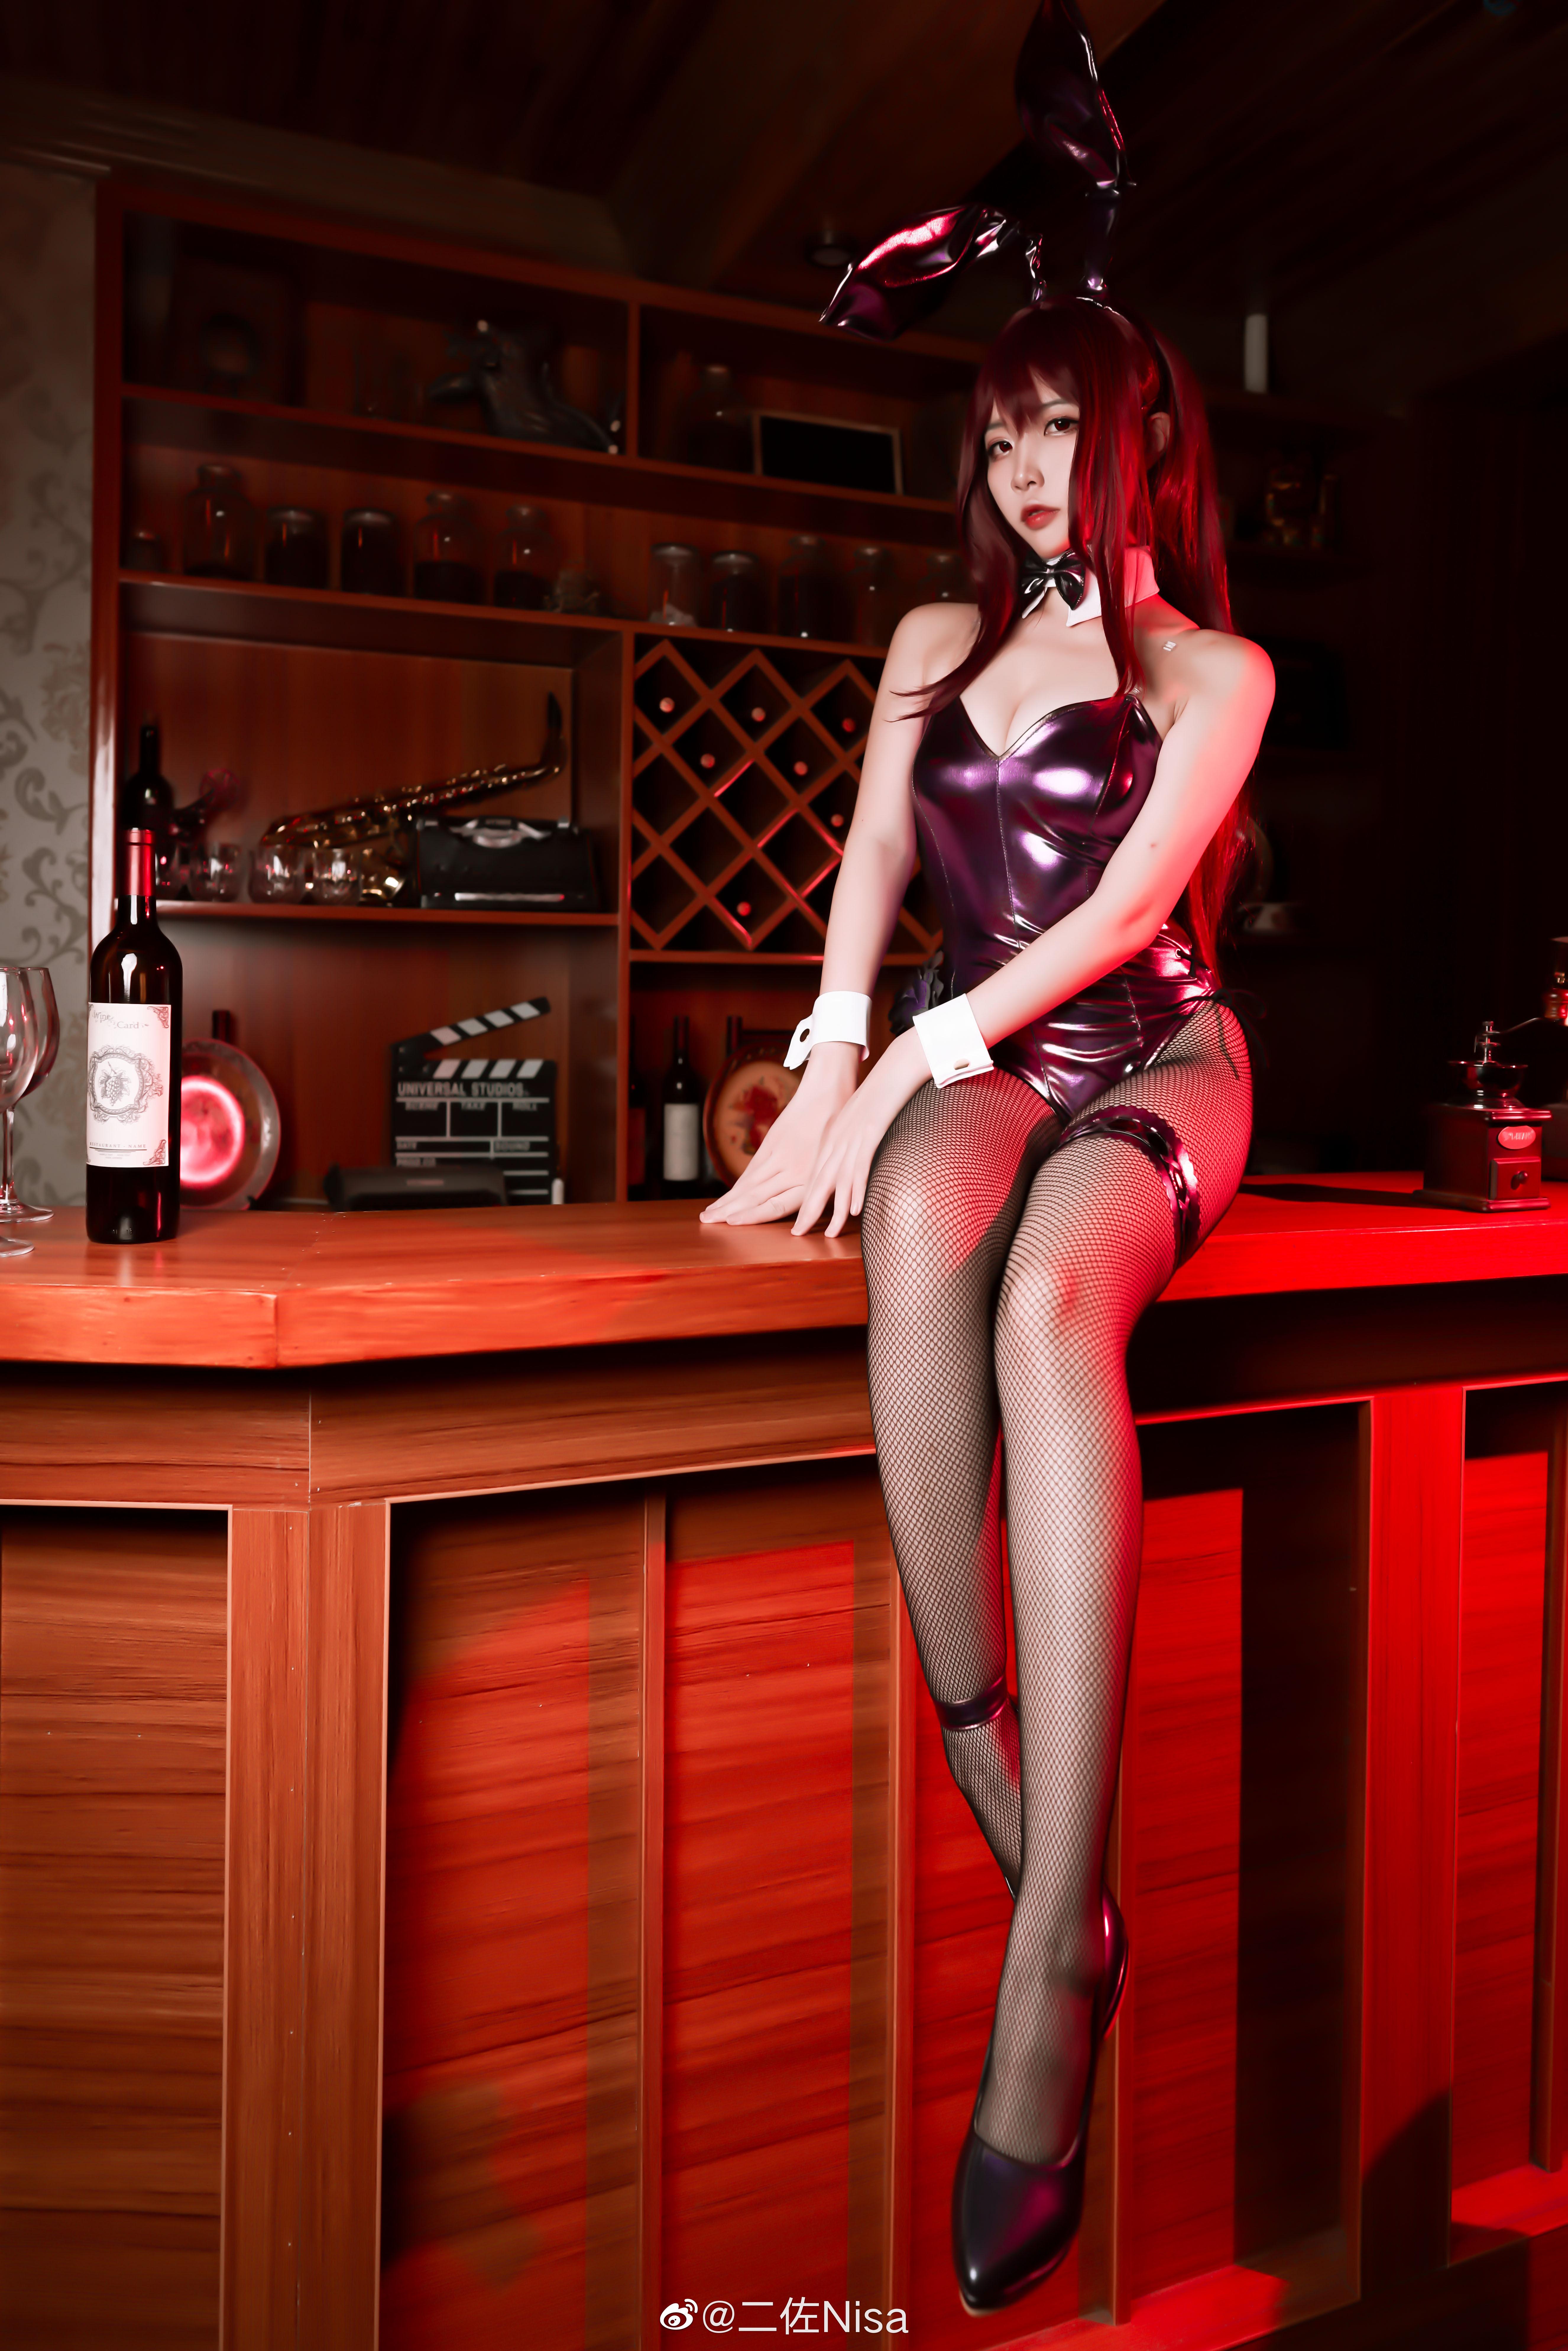 FGO兔女郎cosplay,御主,要一起喝一杯吗?